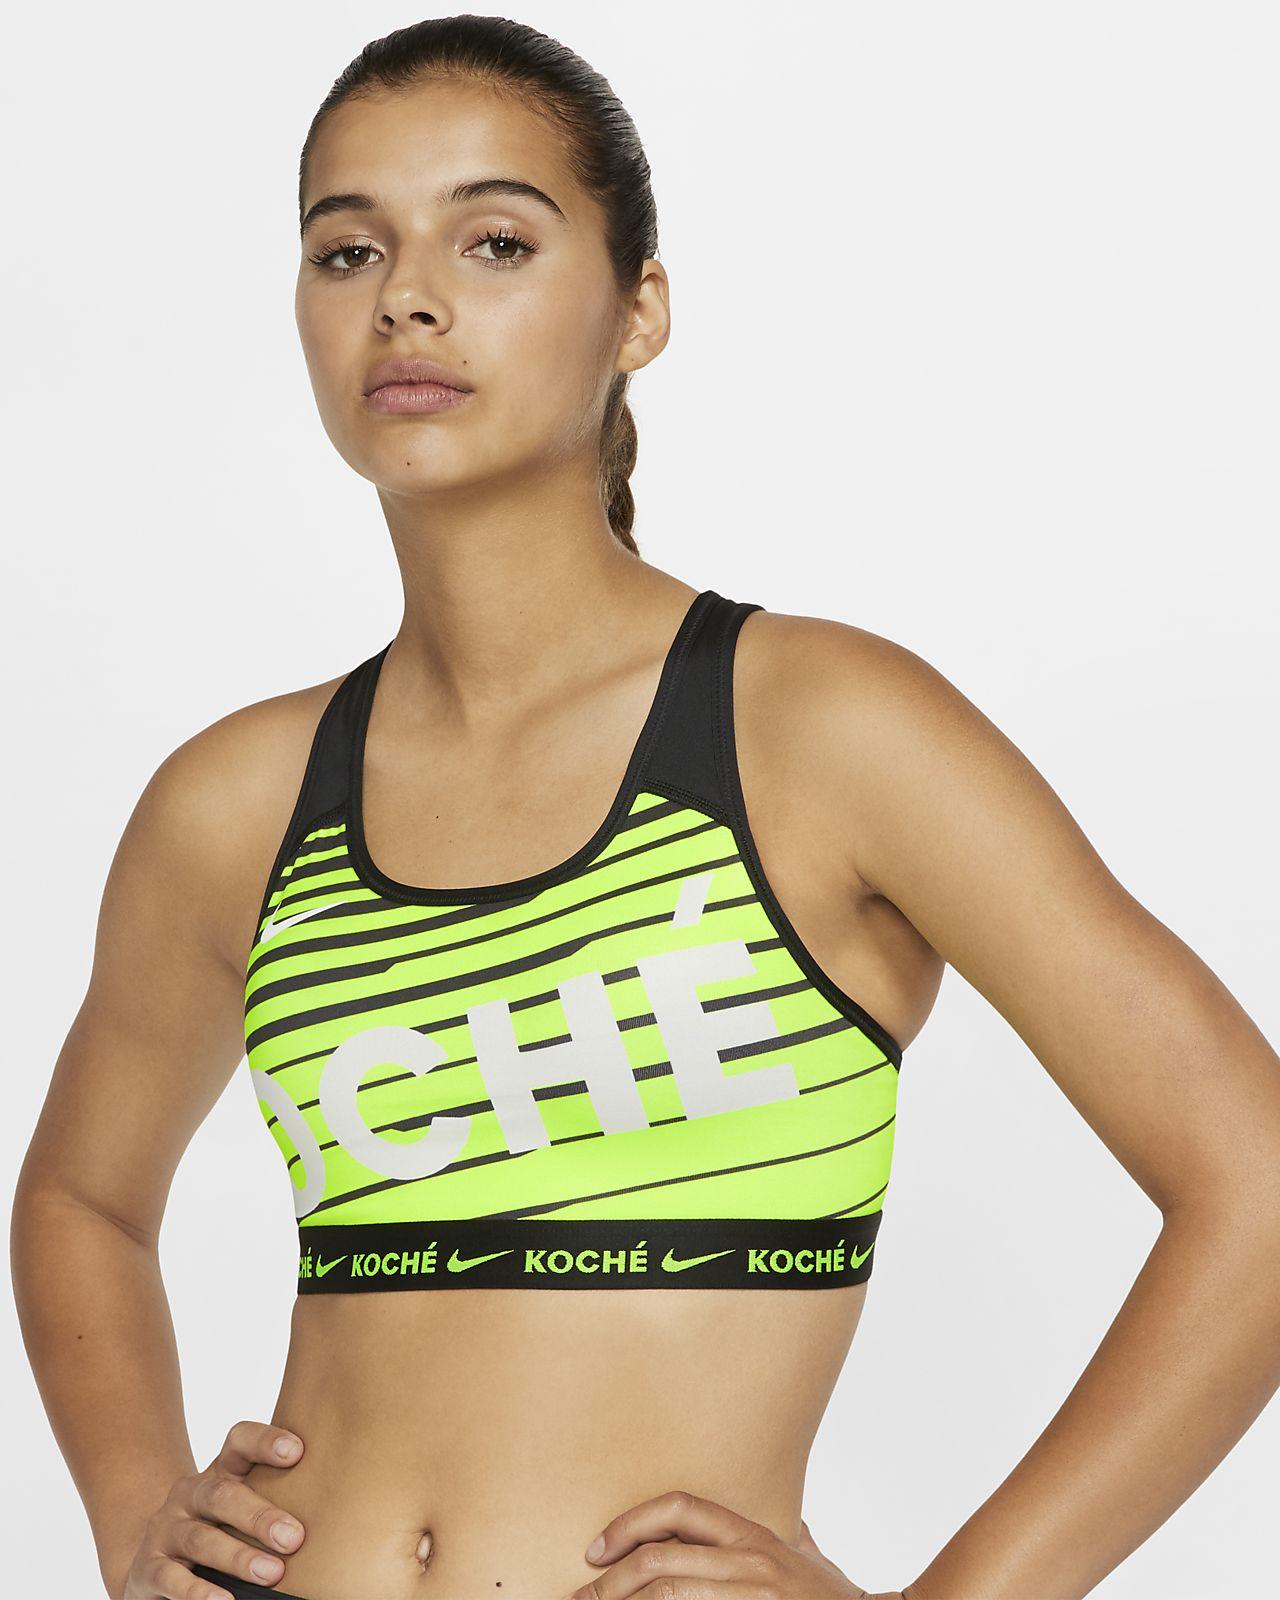 Bra Nike x Koche - Donna